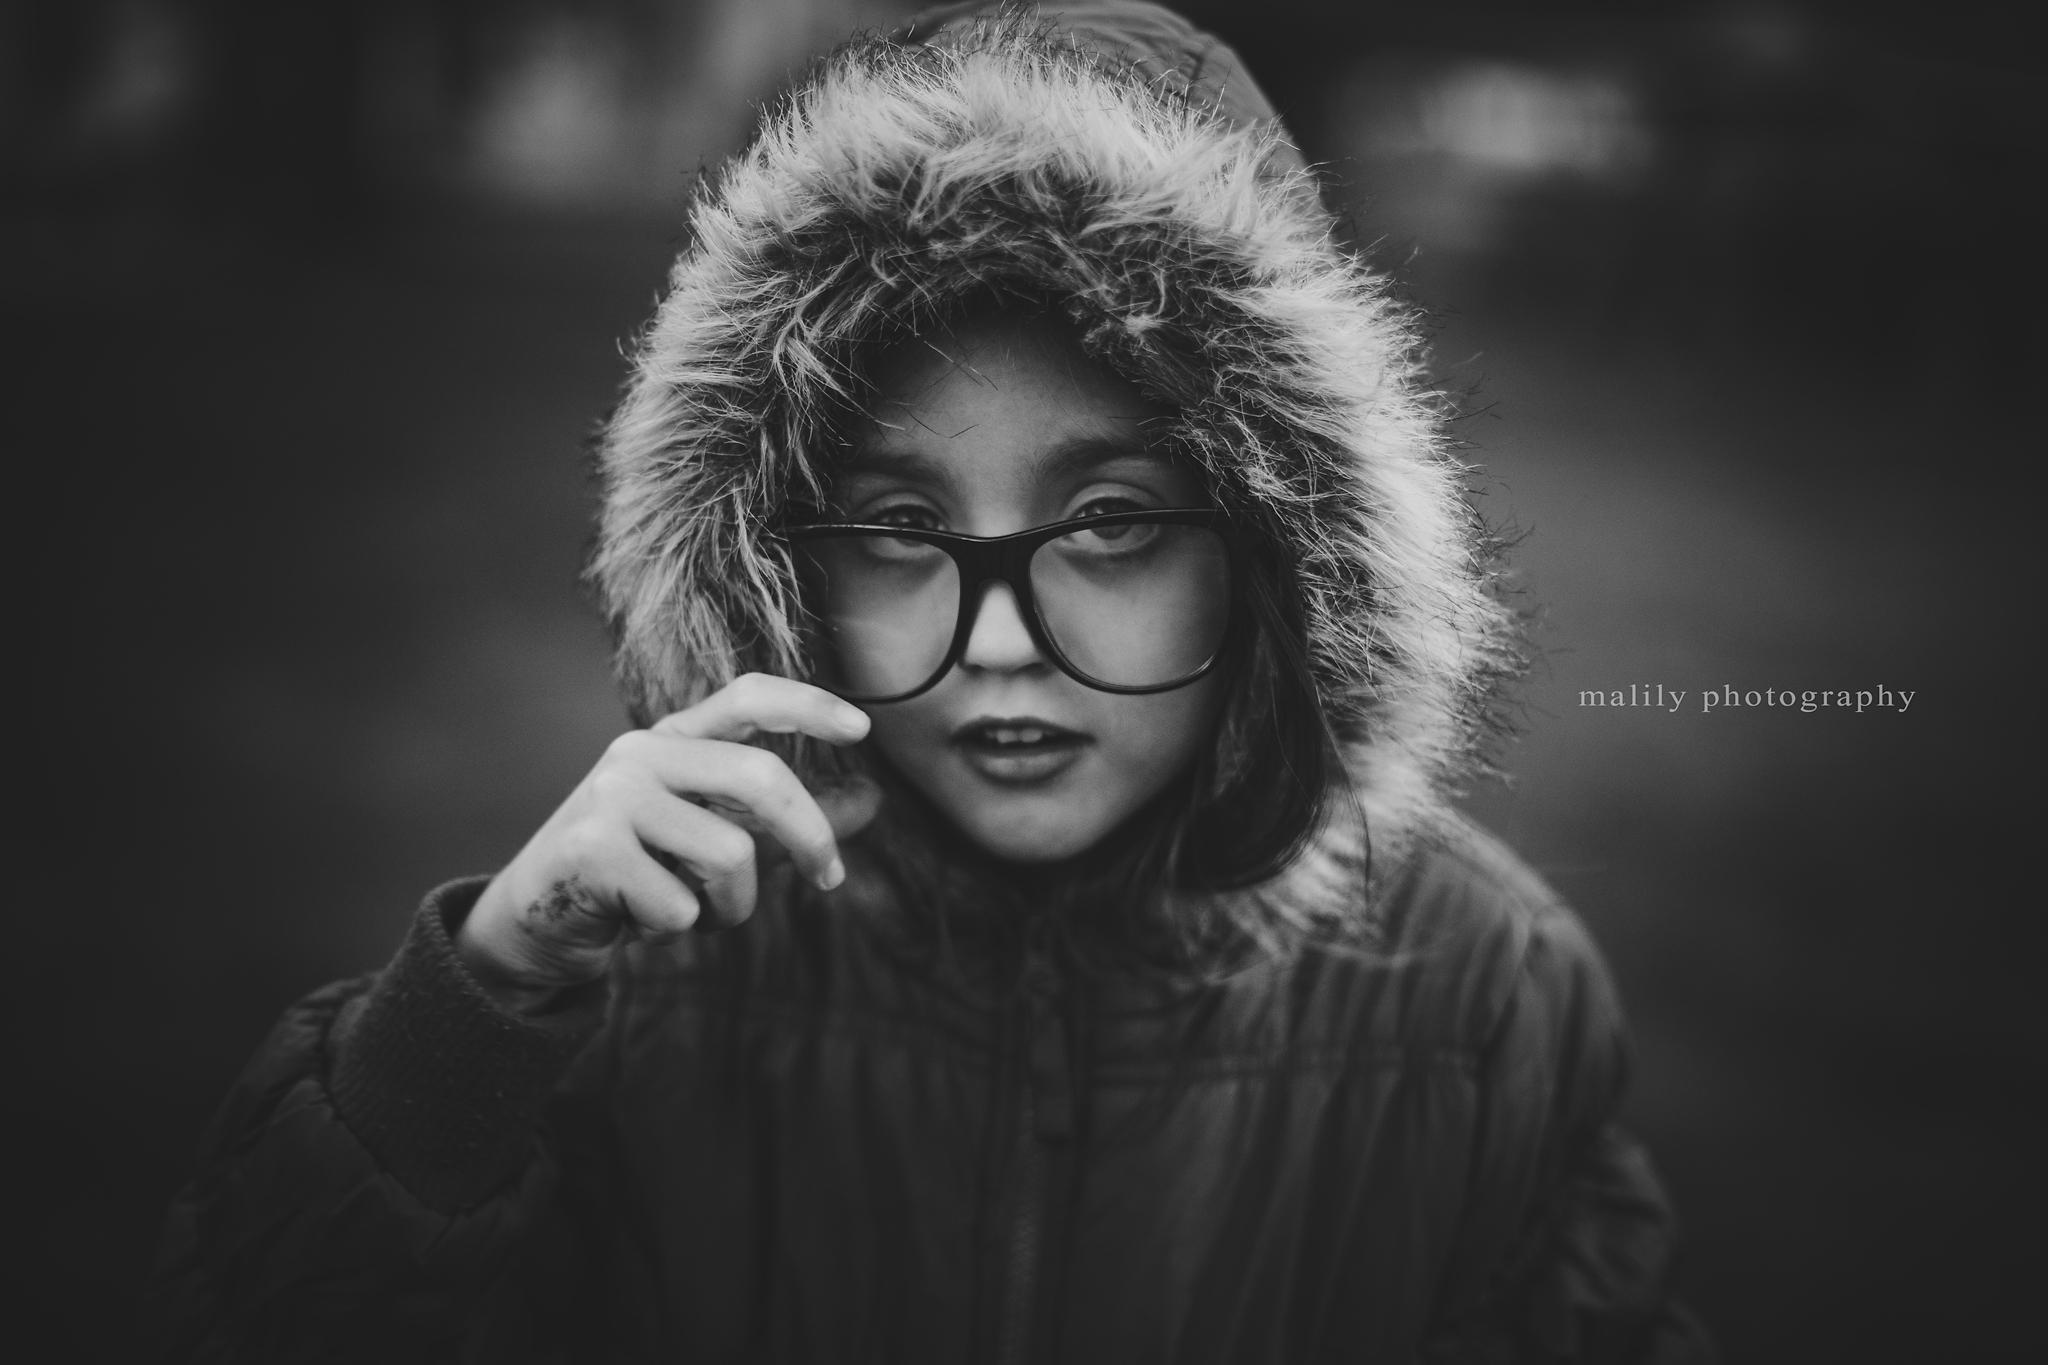 malilyphotography glasses2.jpg